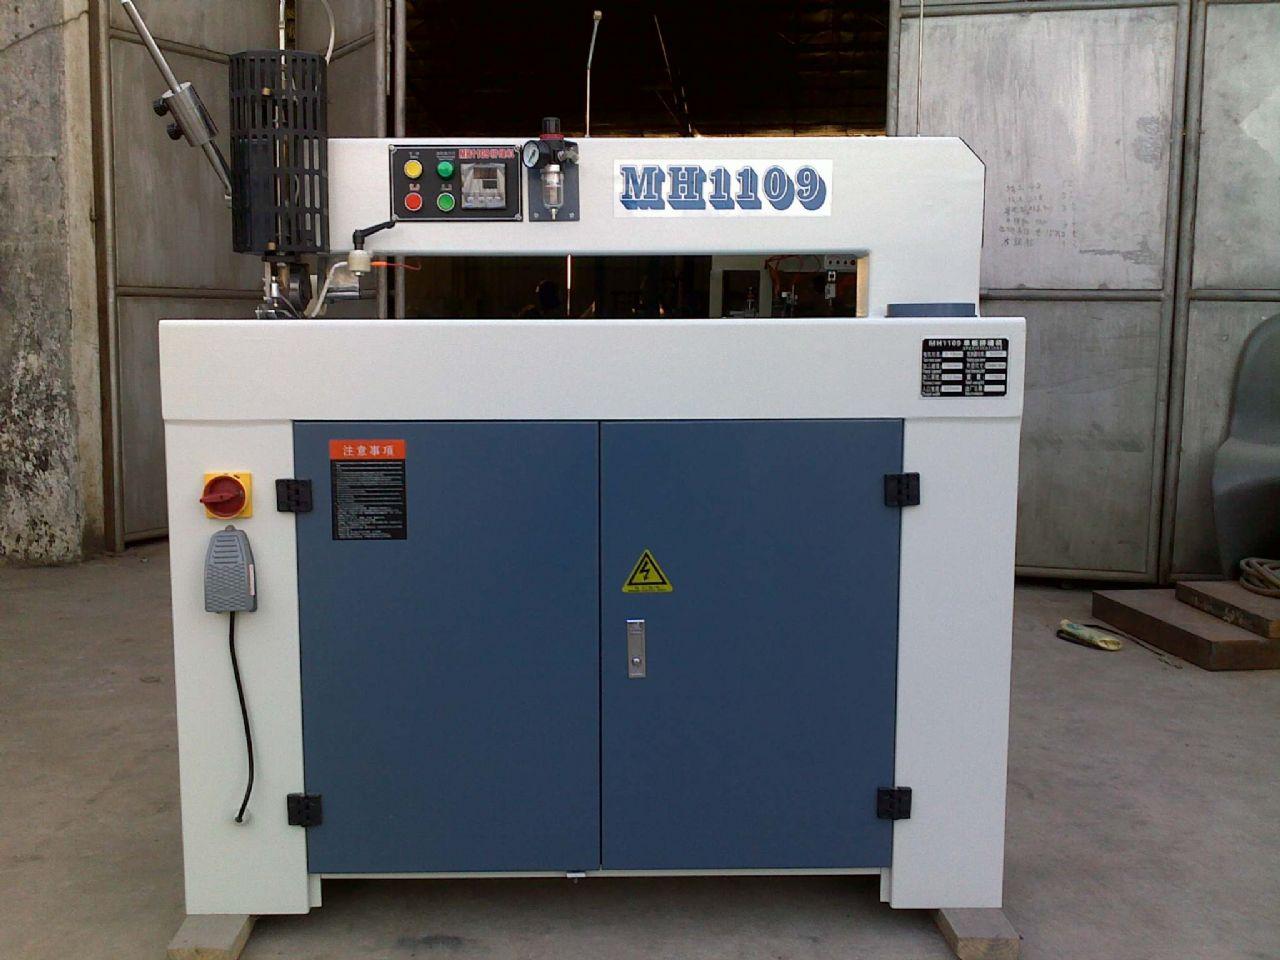 veneer splicing machine/Veneer vertical stitching machine(MH1109)